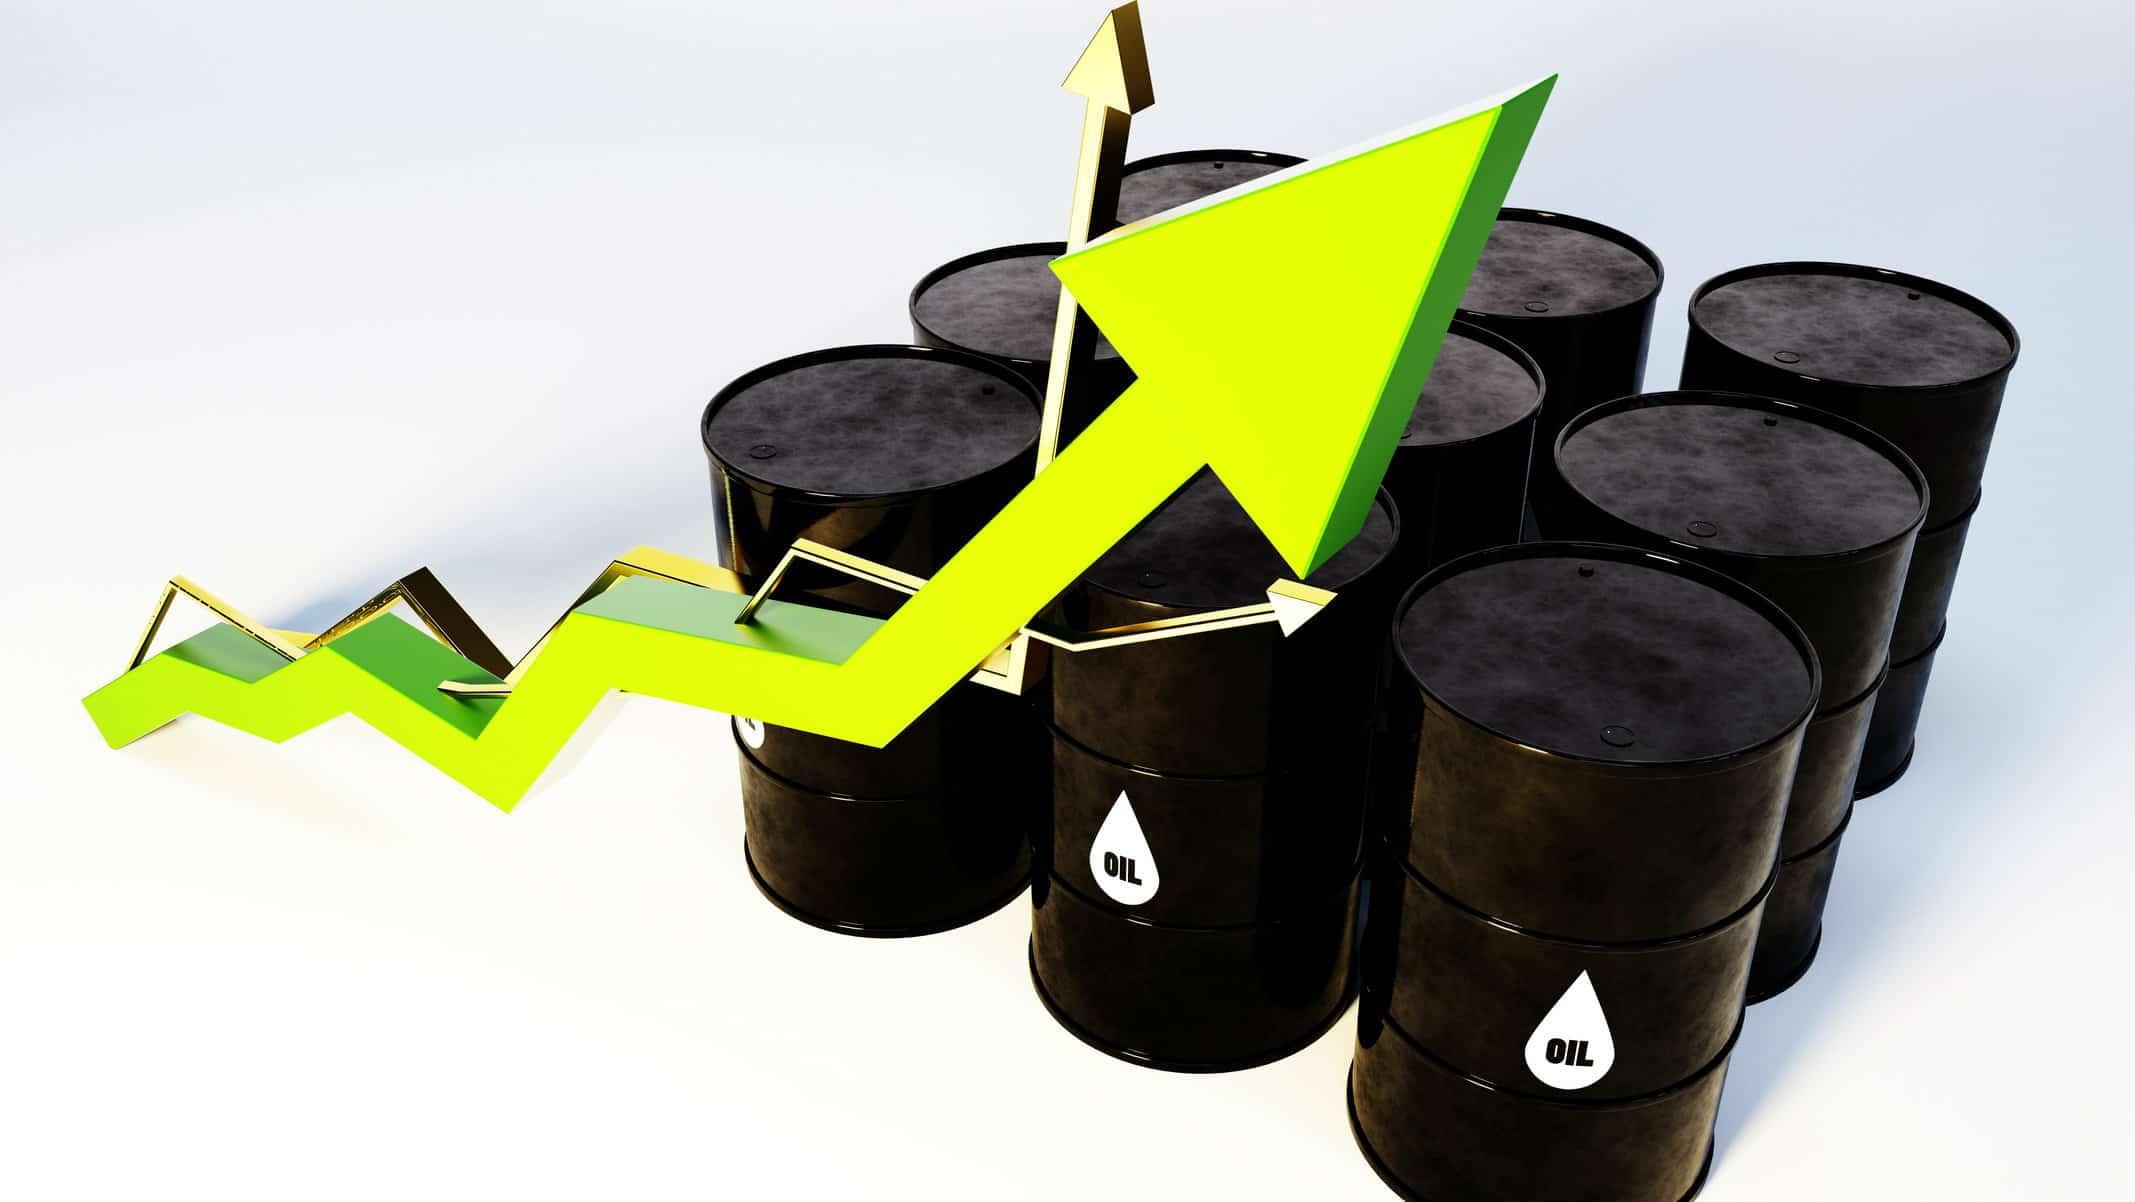 Price of Oil Rising